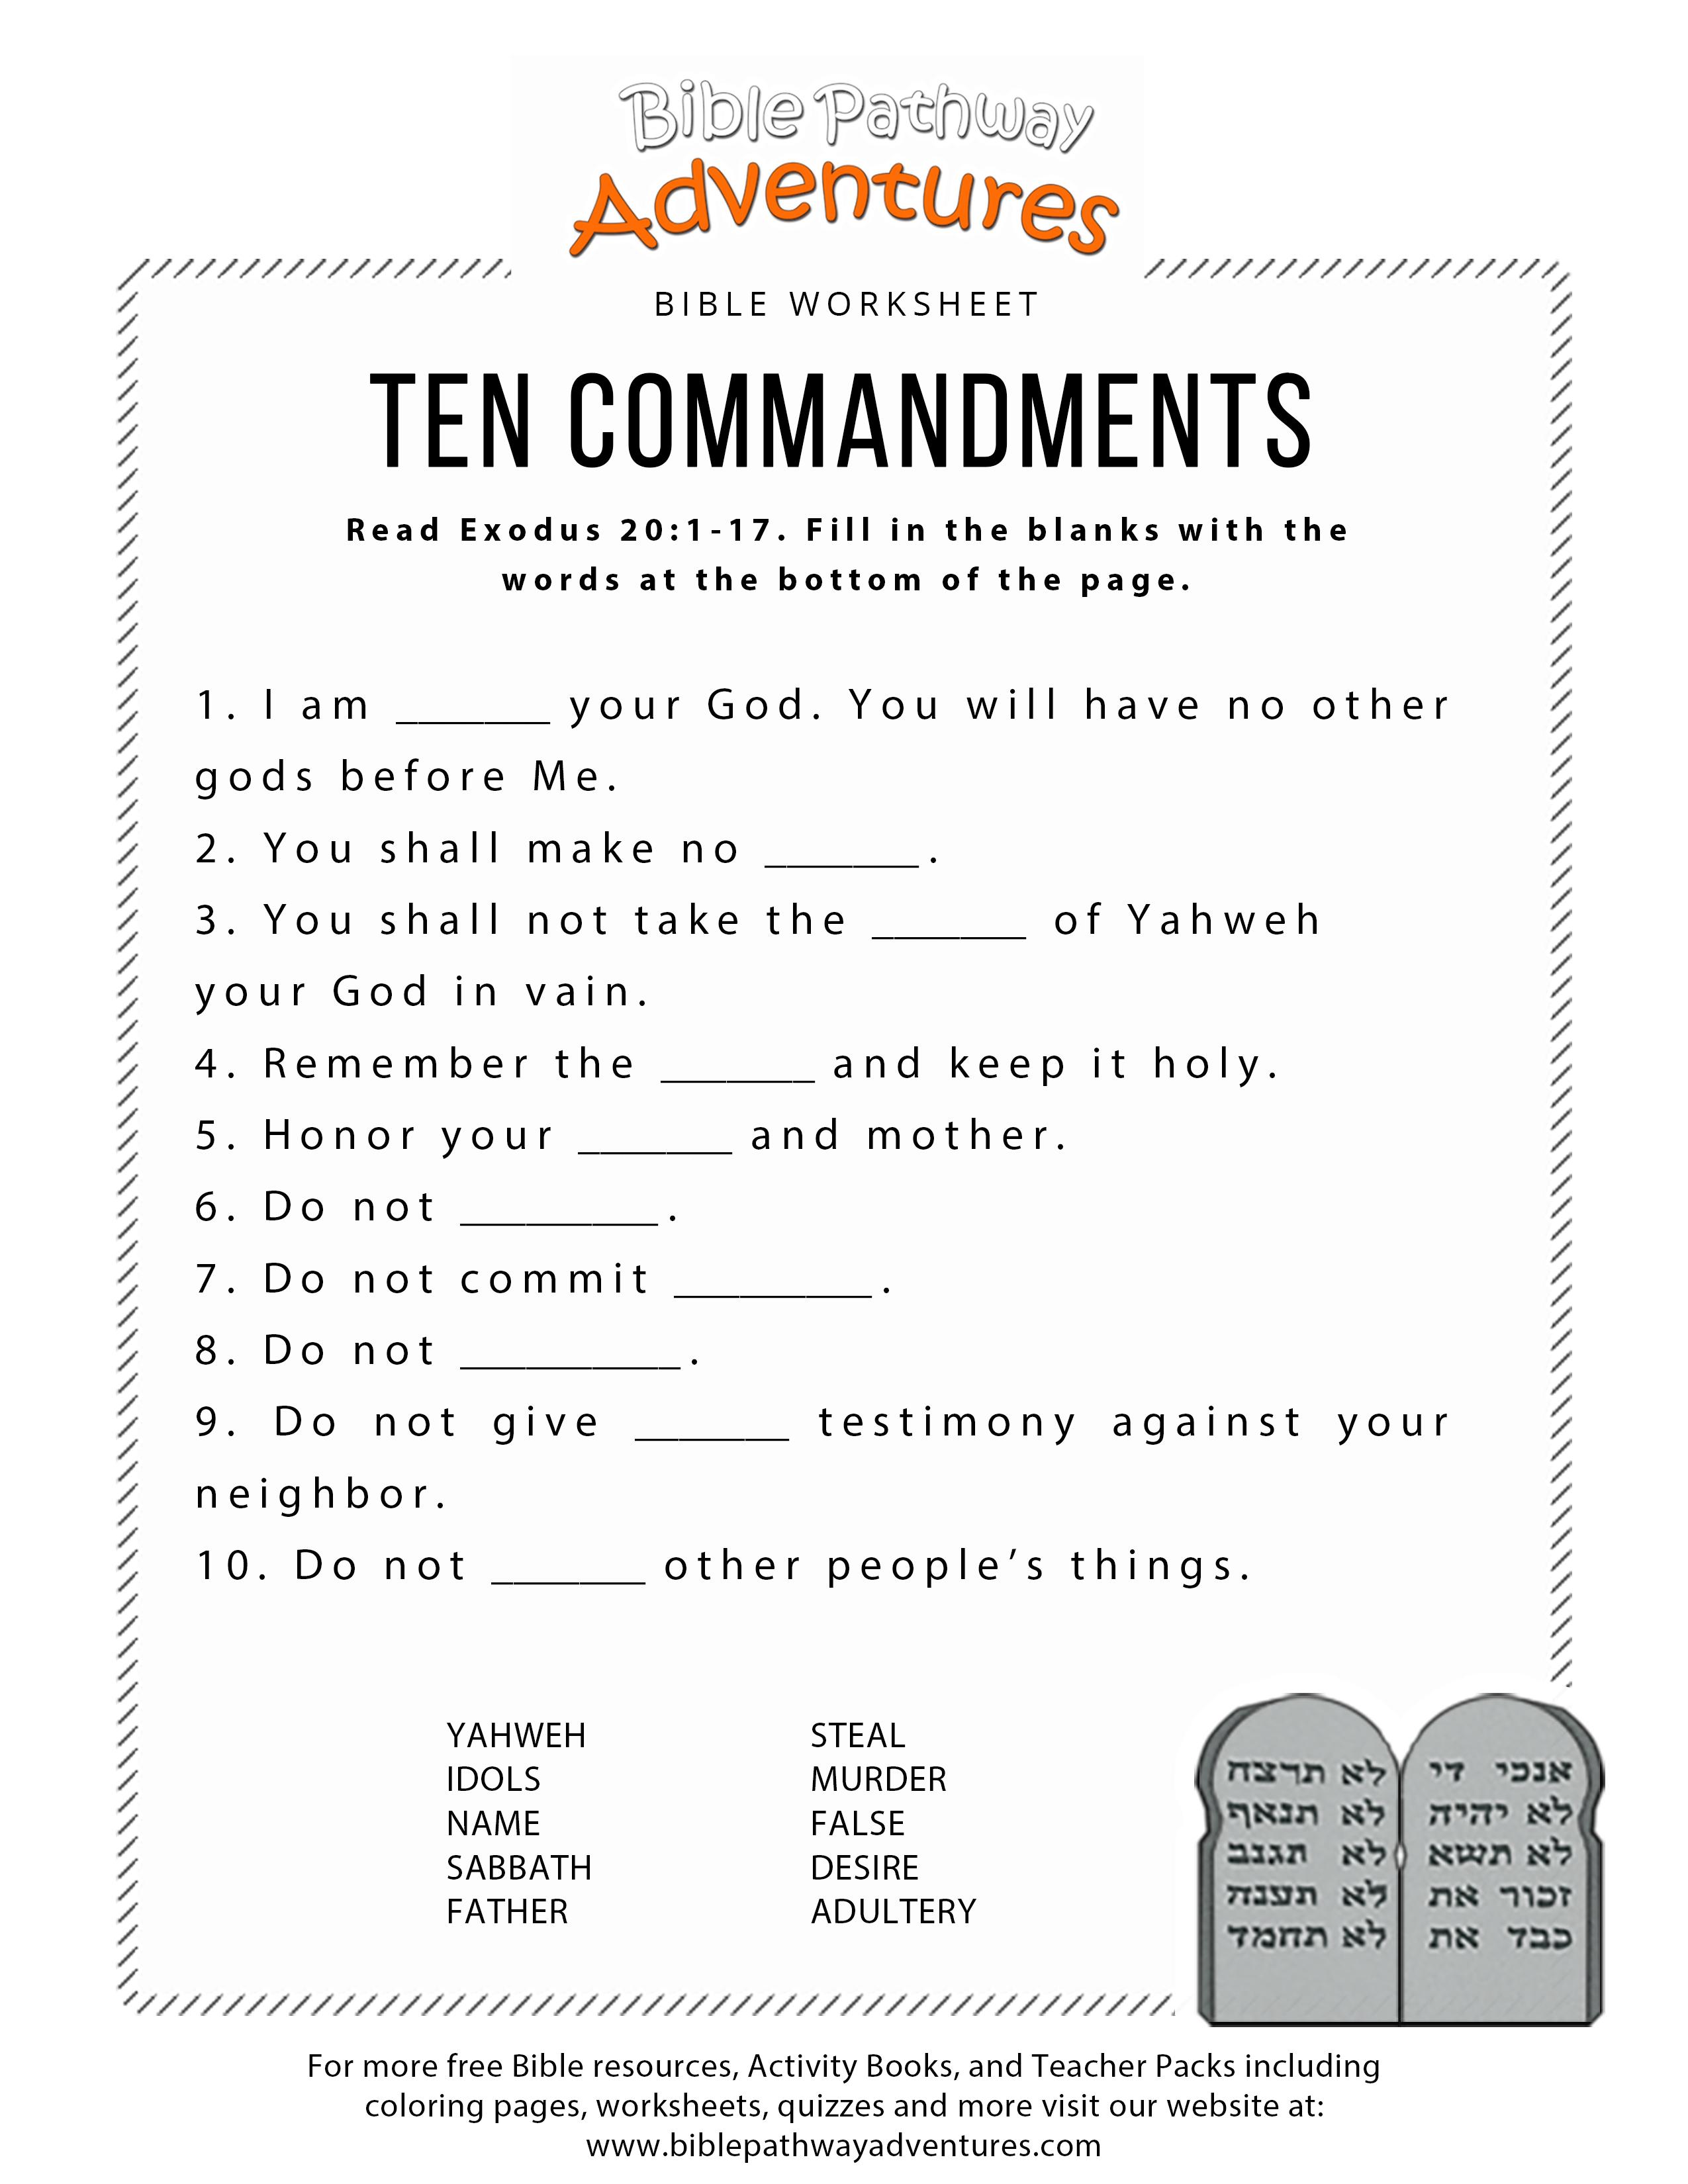 Ten Commandments Worksheet For Kids | Worksheets For Psr | Bible - Free Printable Sunday School Lessons For Kids